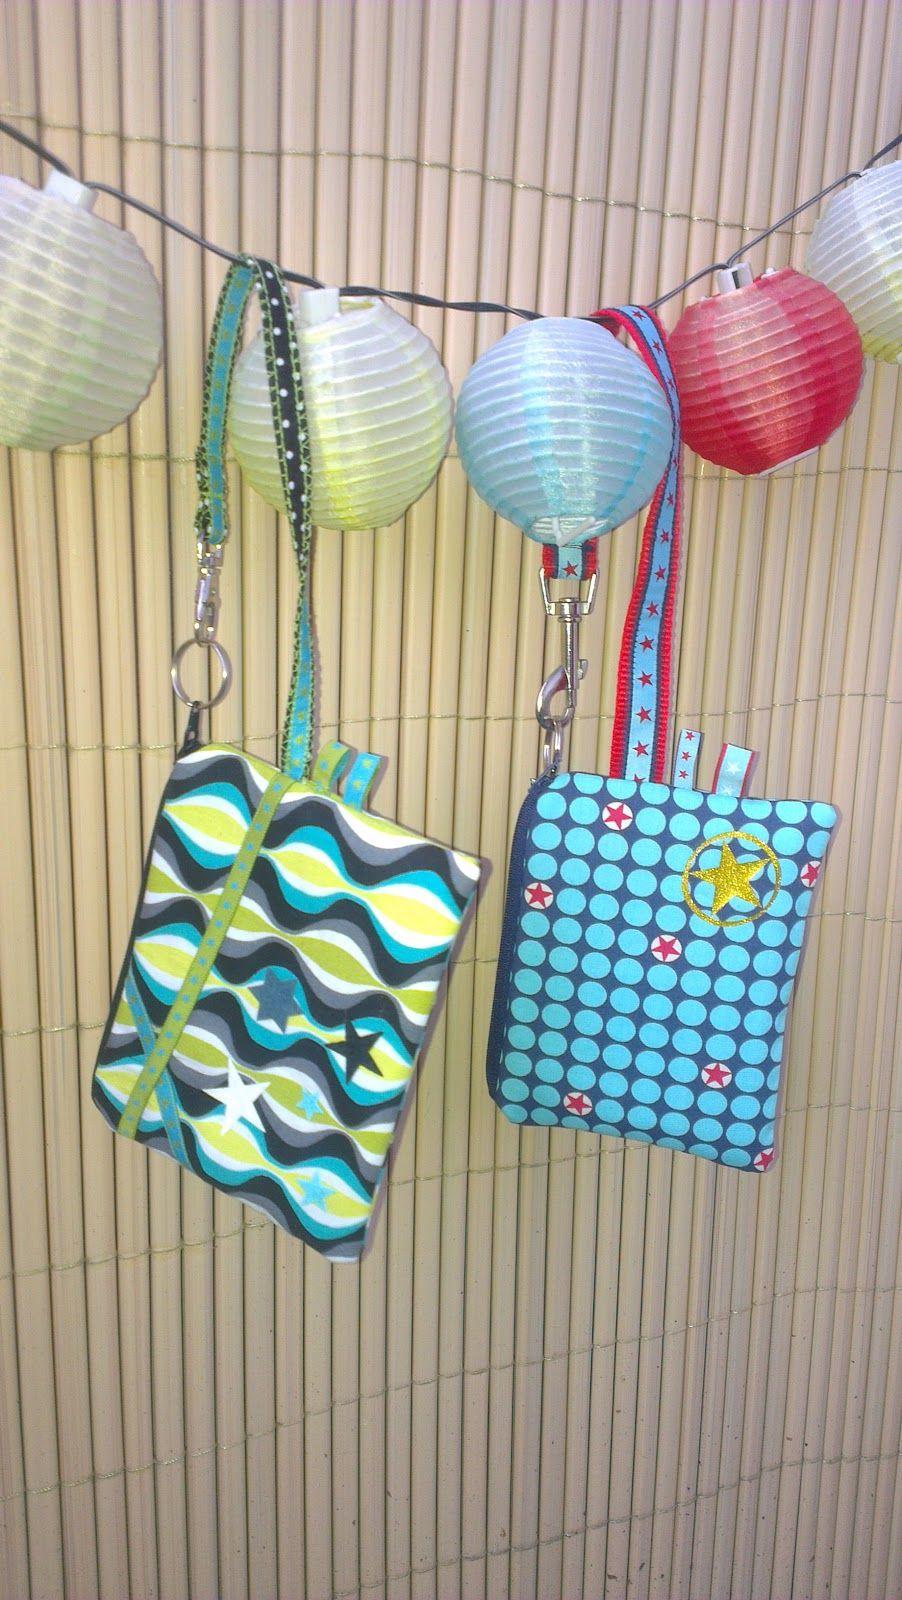 nieliqui handmade: Taschenspieler Sew-Along: Karo